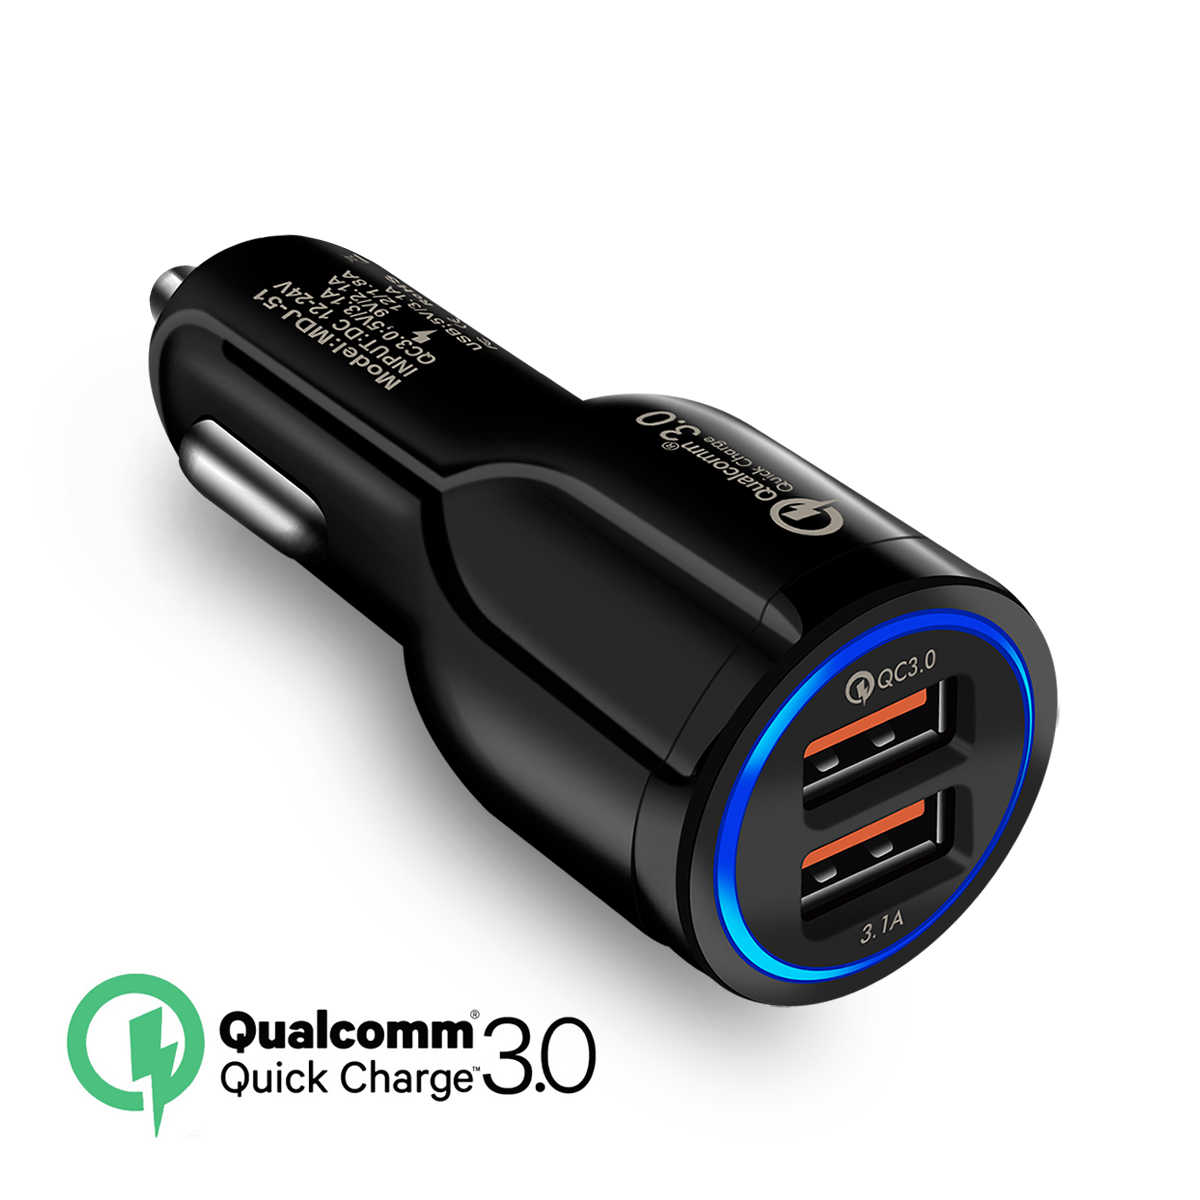 QC3.0 クイック車の充電アダプタユニバーサル携帯電話充電器 Iphone × 8 7 4 5 6 6s プラスサムスン Xiaomi 高速充電